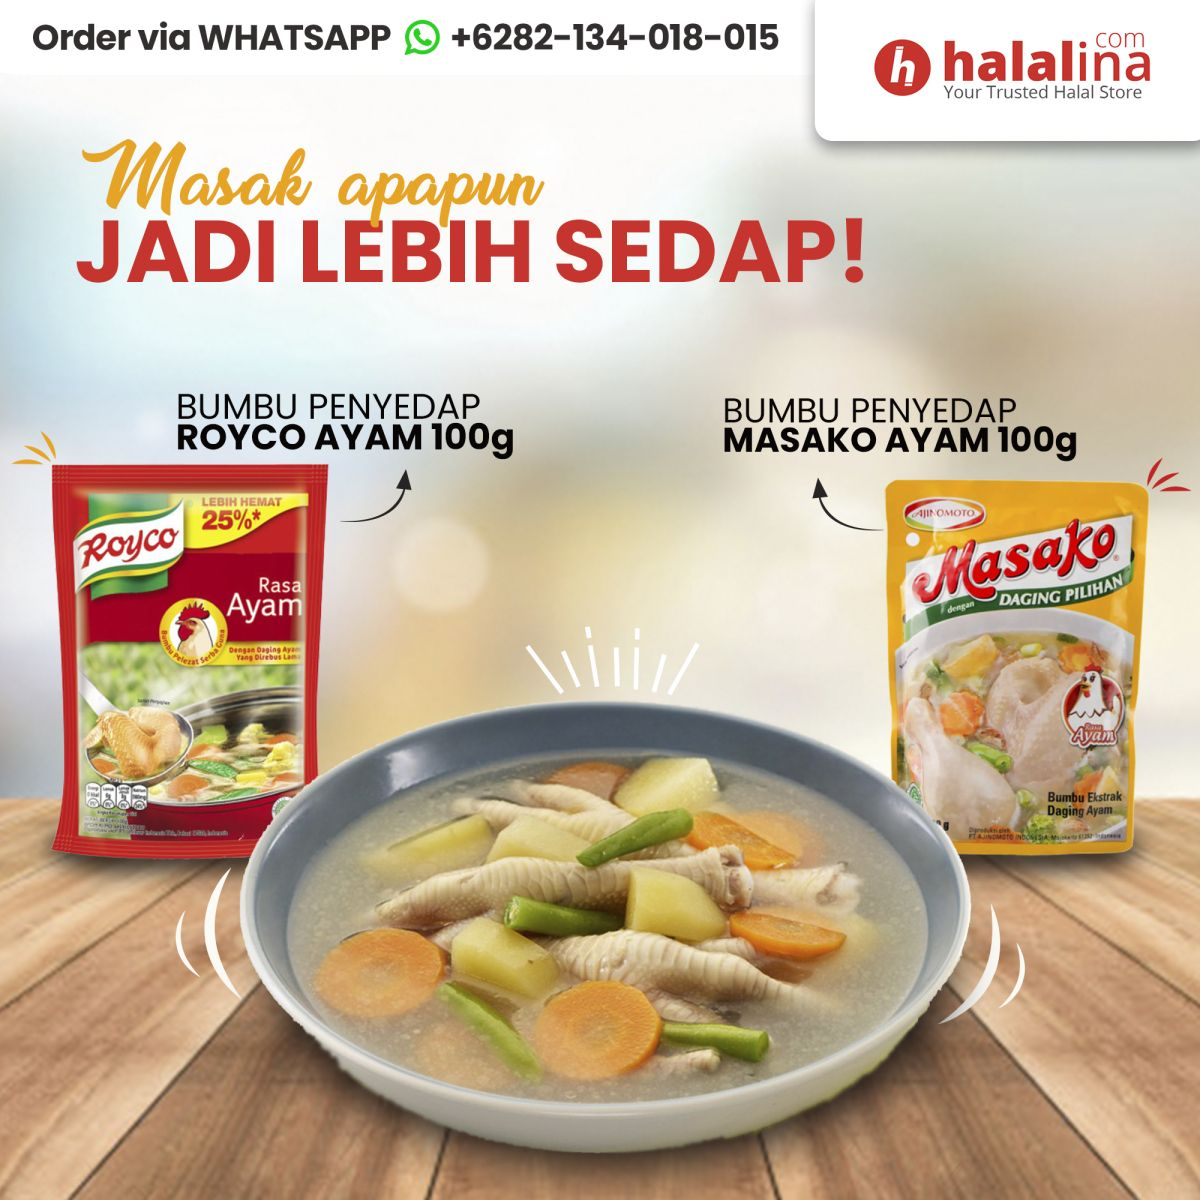 Phone 62 821 3401 8015 Halal Food Tokyo In Japan In 2020 Halal Recipes Food Japan Food